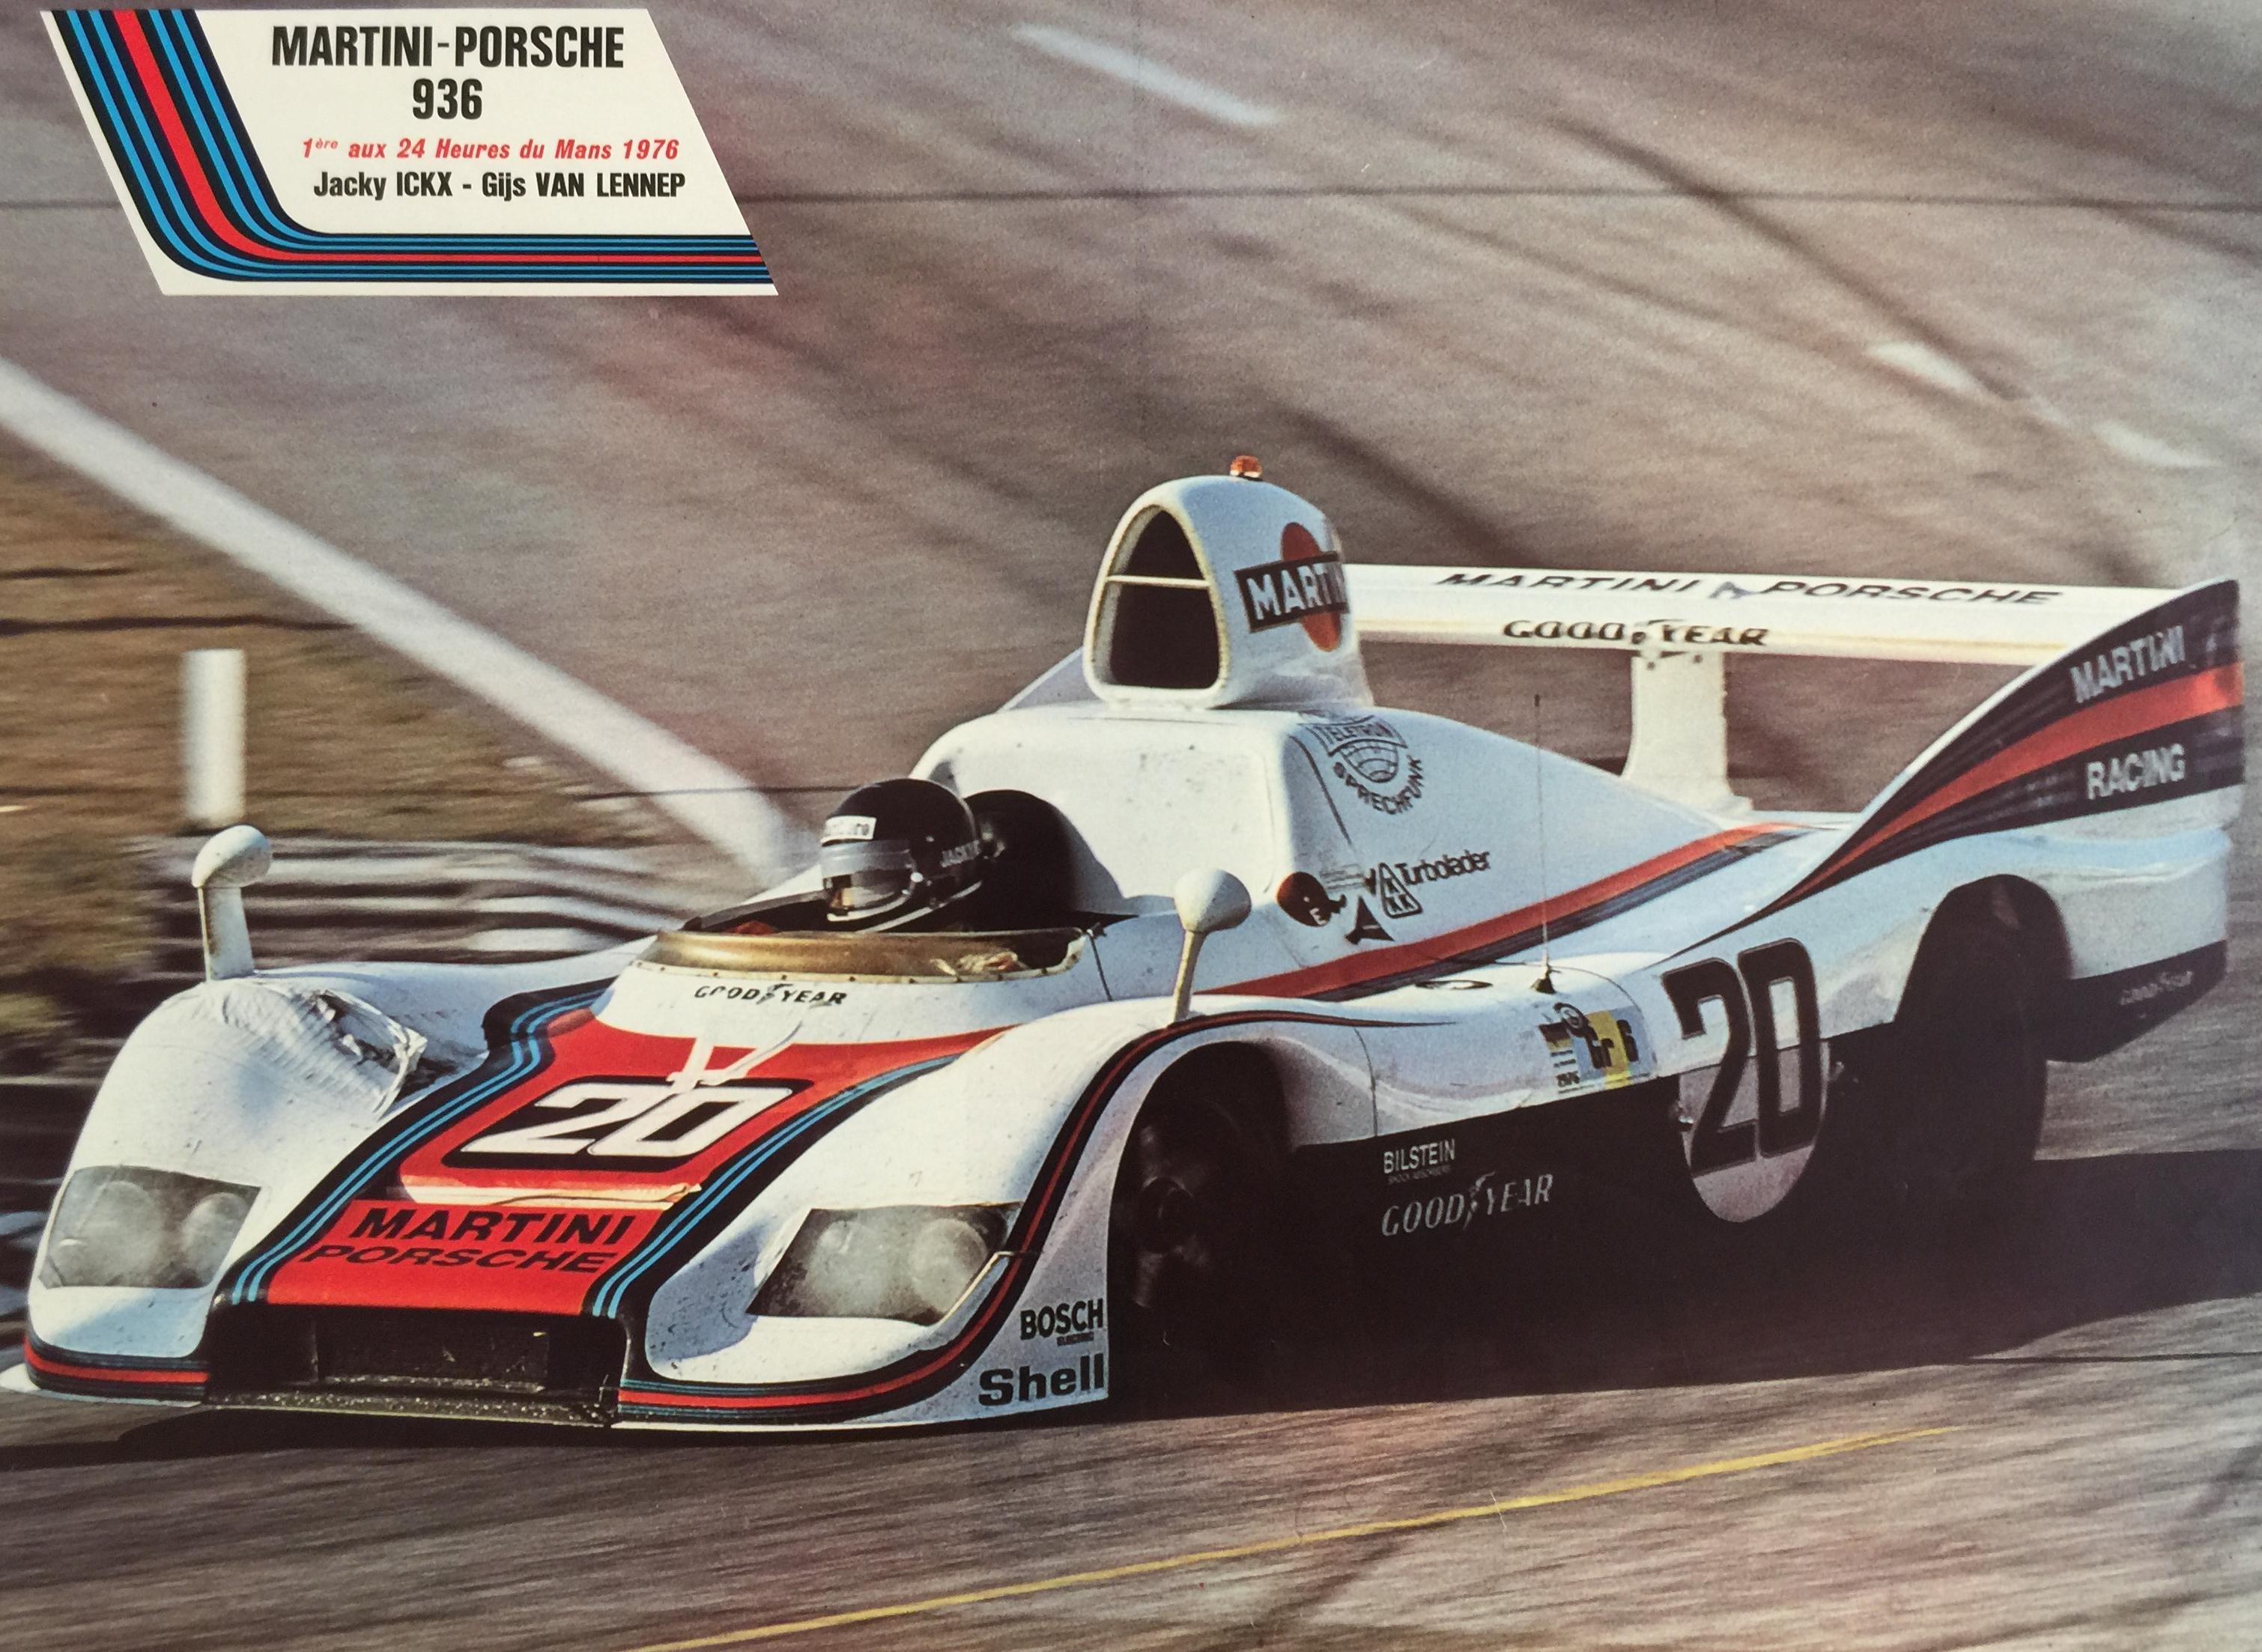 Martini-Porsche Jacky Ickx 1976 Original Vintage Poster